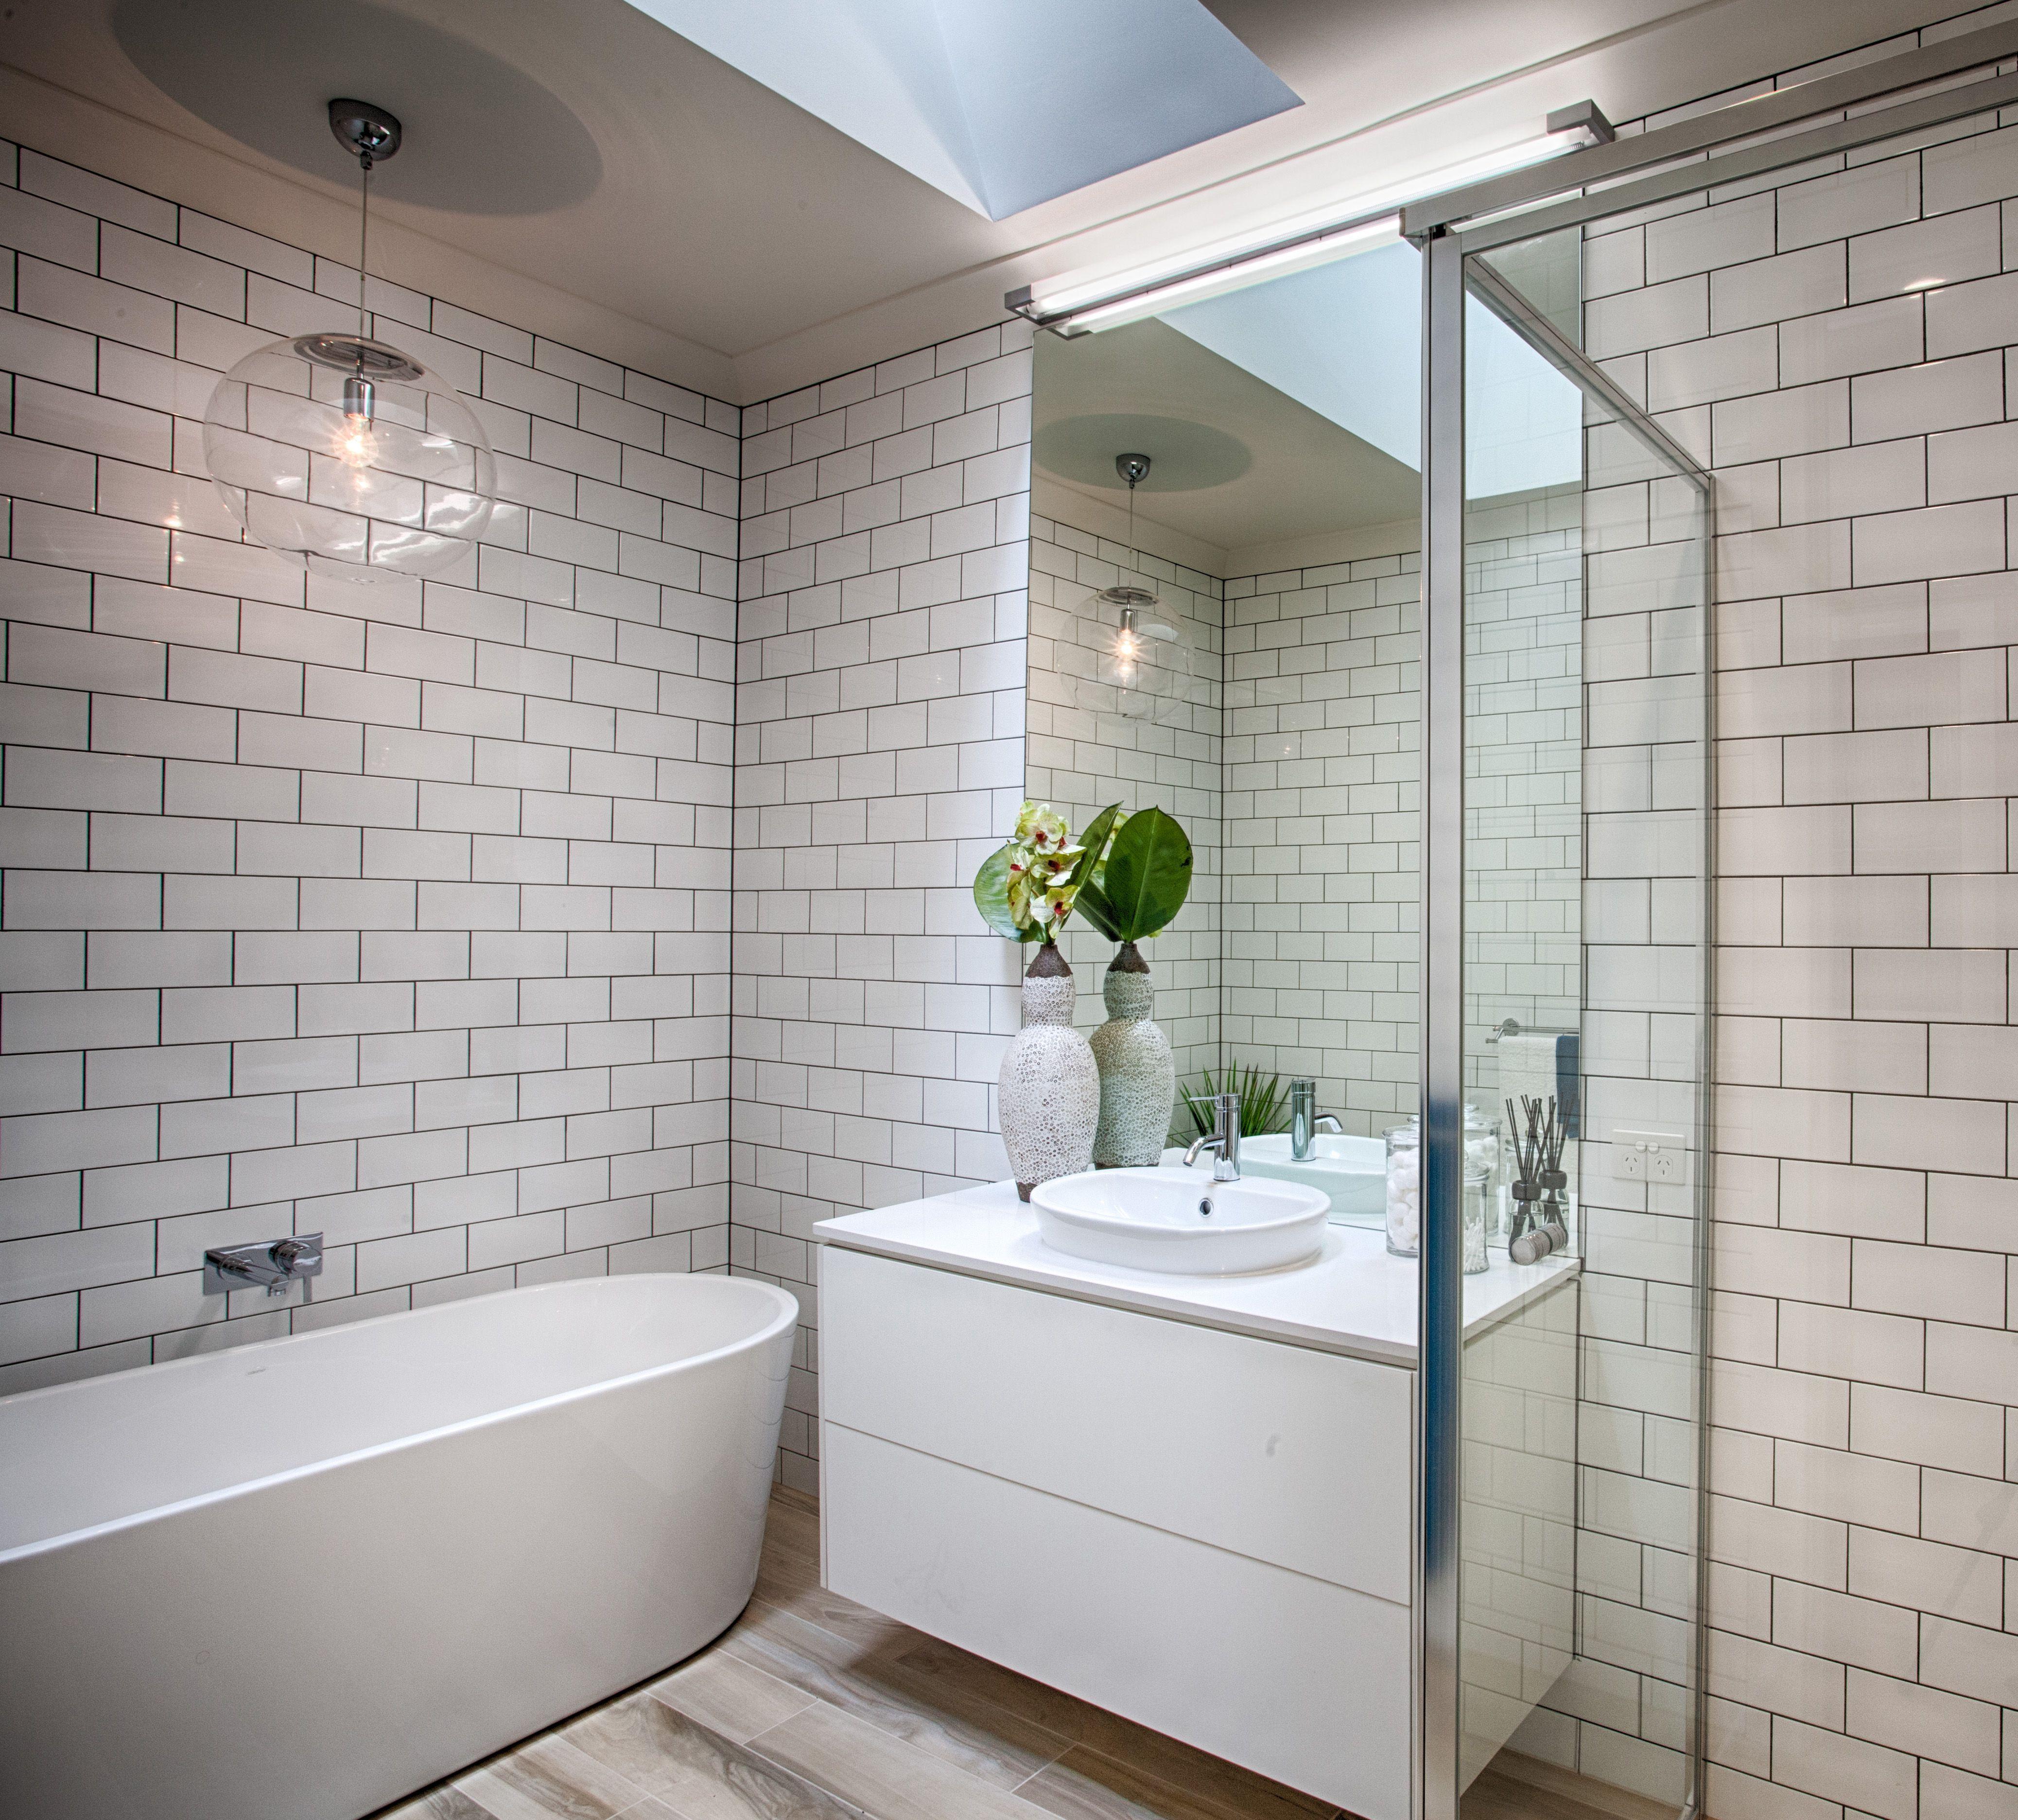 A Very Modern Styled Bathroom With 'brick' Tiles